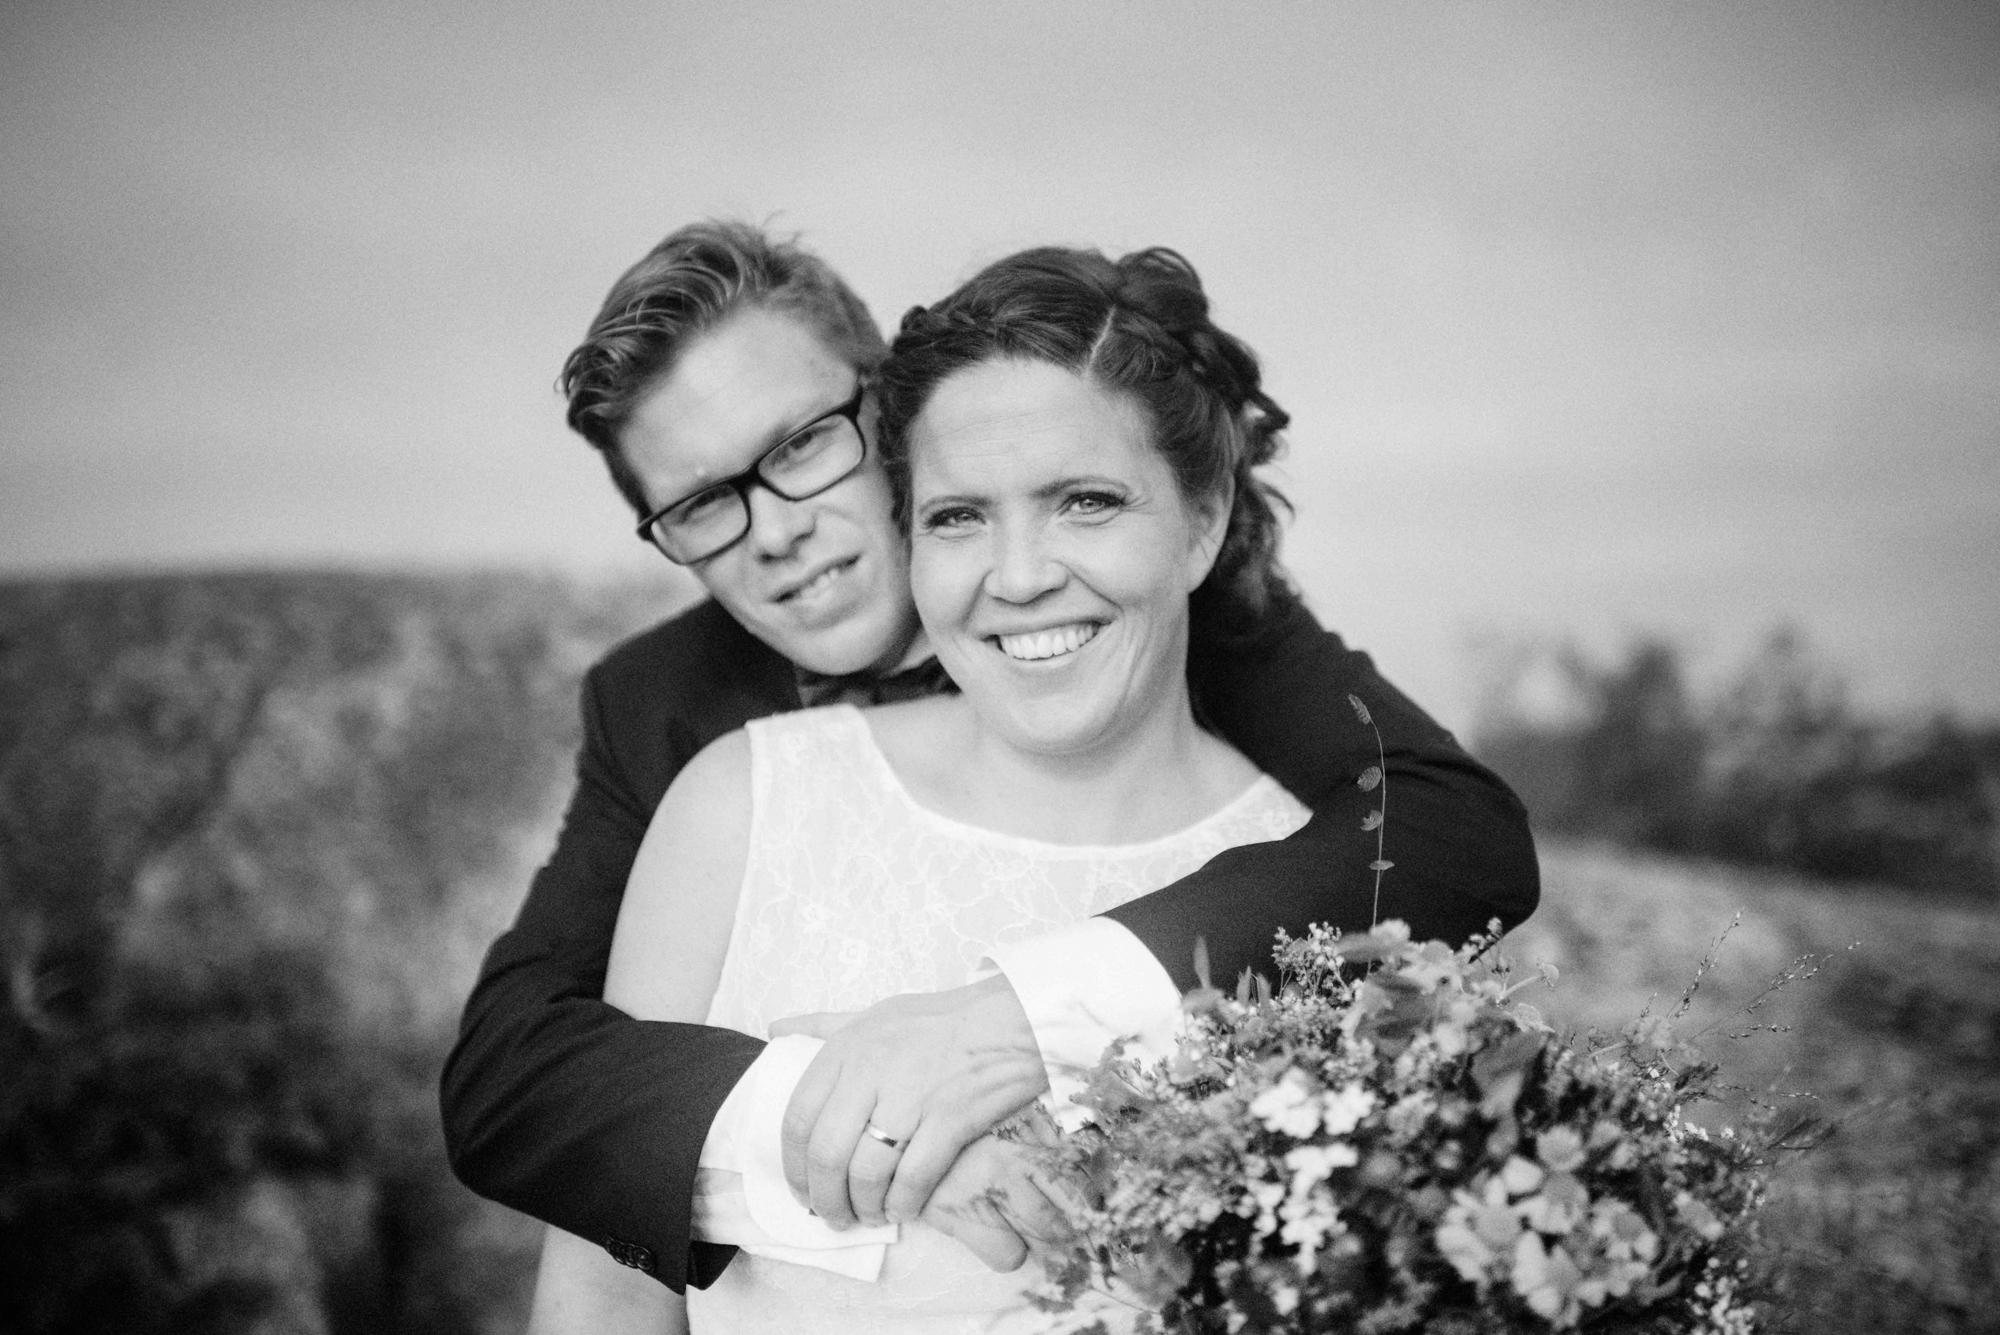 brandochbrindle_anineoscar_bröllop_finnhamn_DSC_9728.jpg